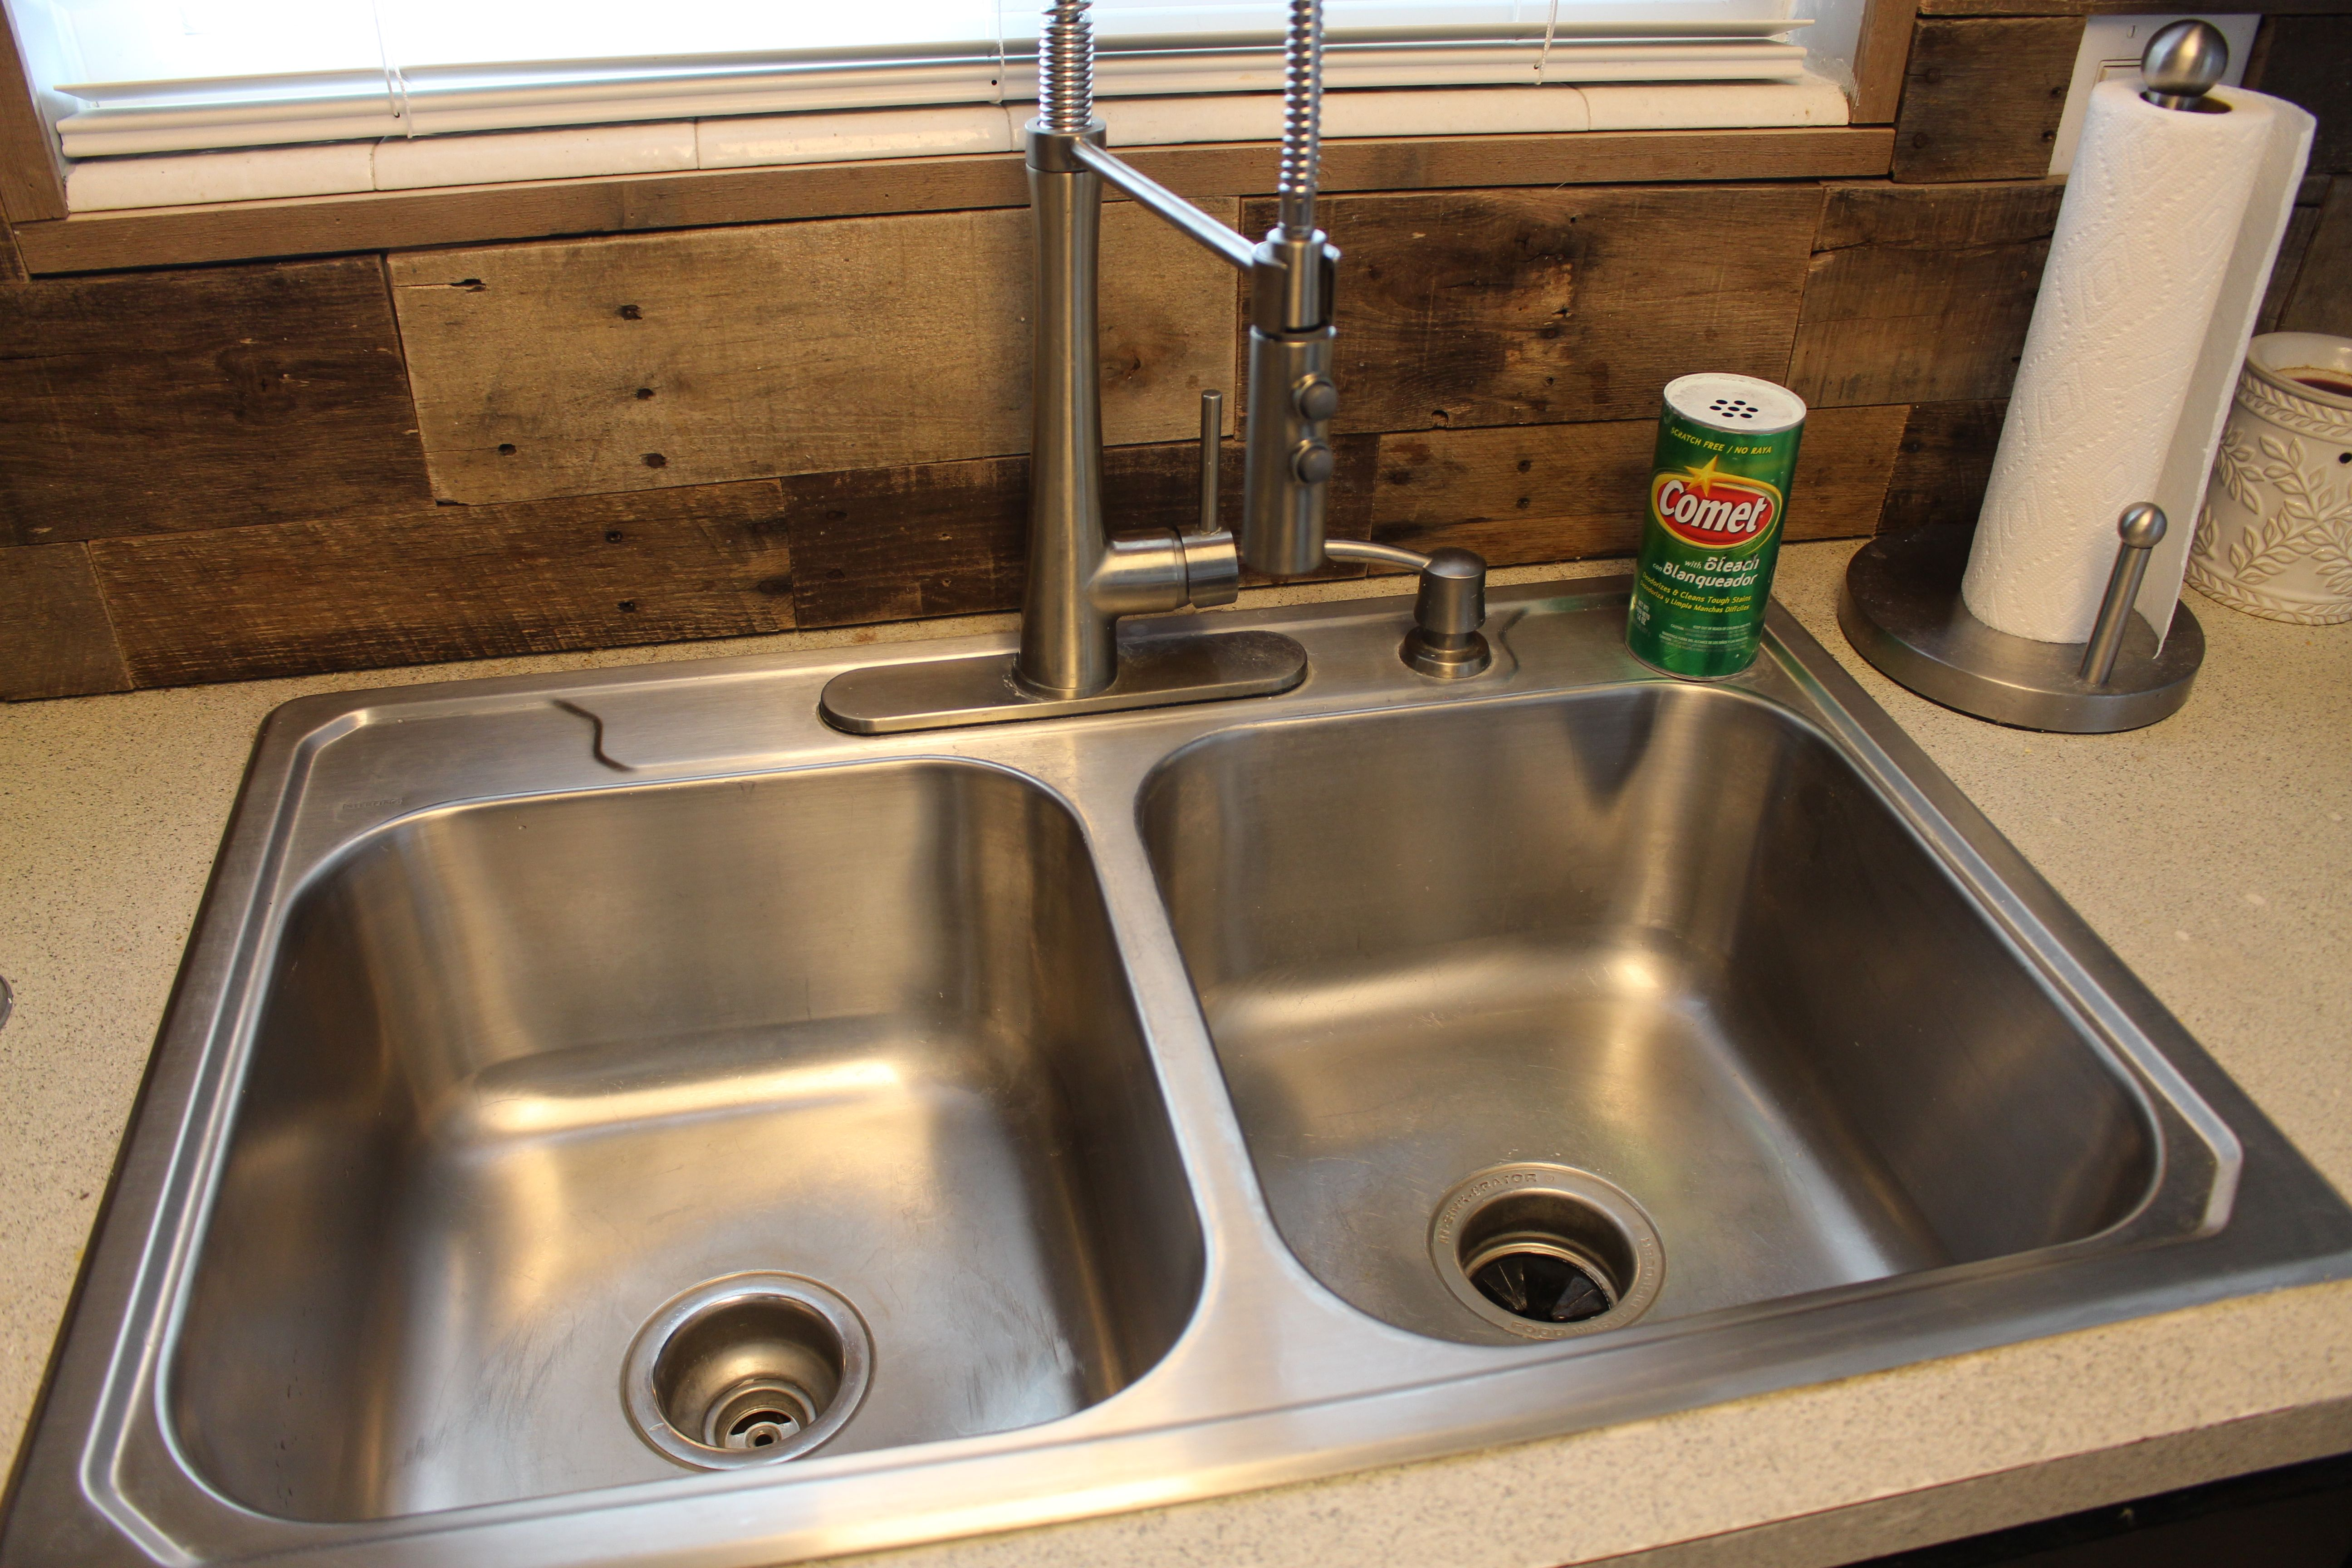 Go to Bed with a CLEAN kitchen sink! Clean kitchen sink